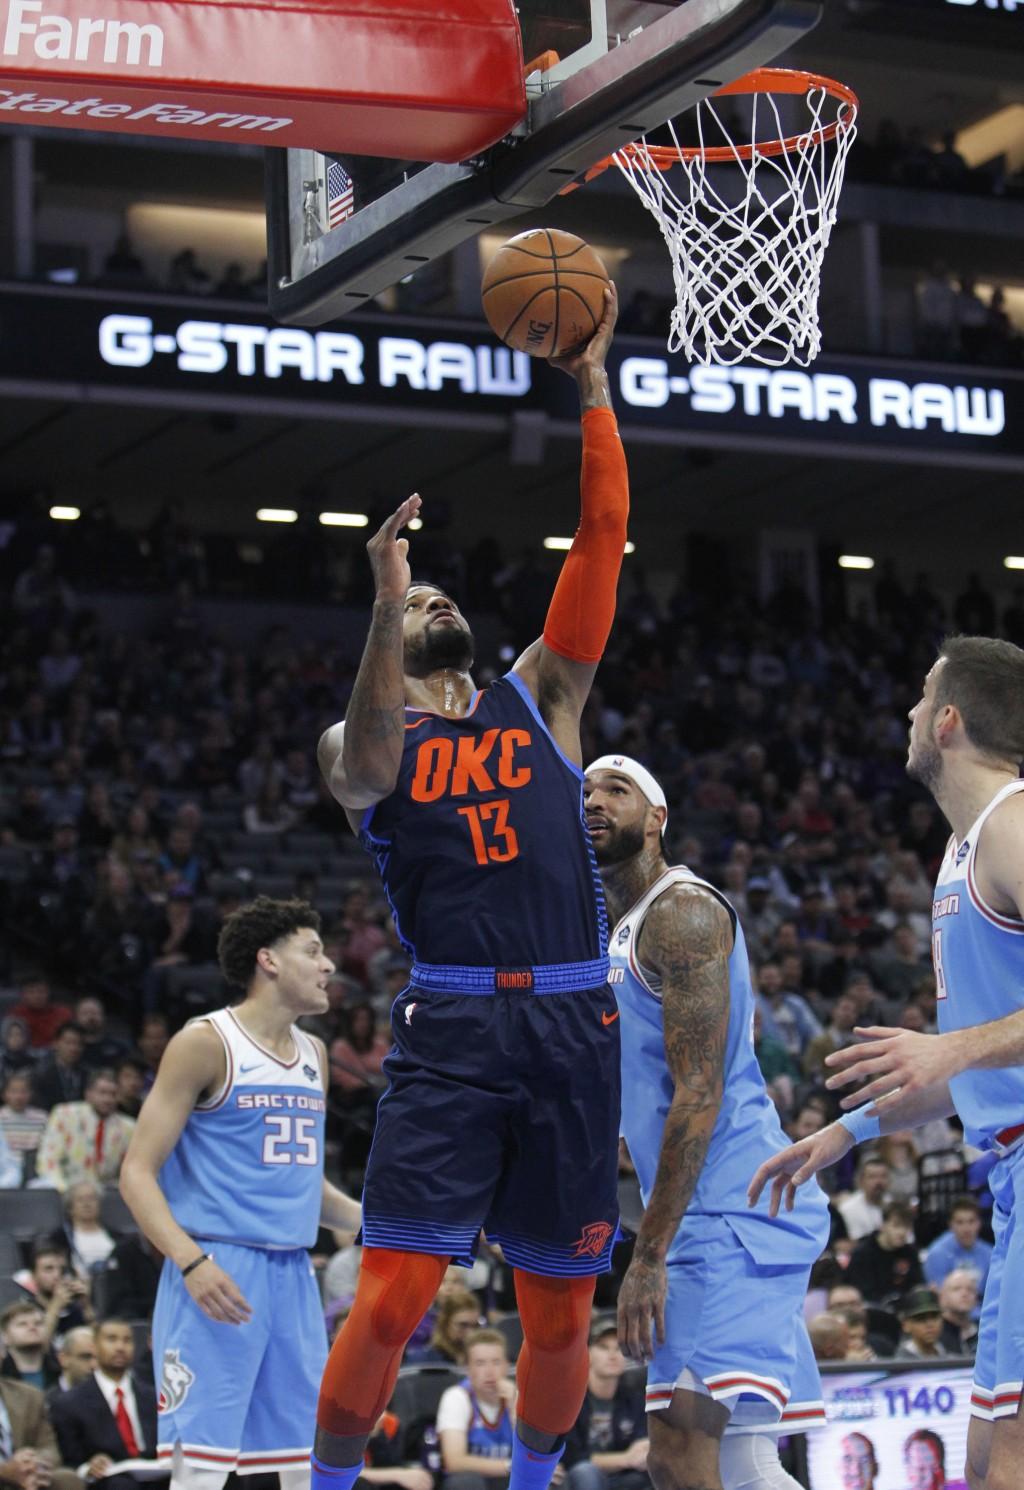 Oklahoma City Thunder forward Paul George (13) breaks away for a basket against the Sacramento Kings during the first half of an NBA basketball game i